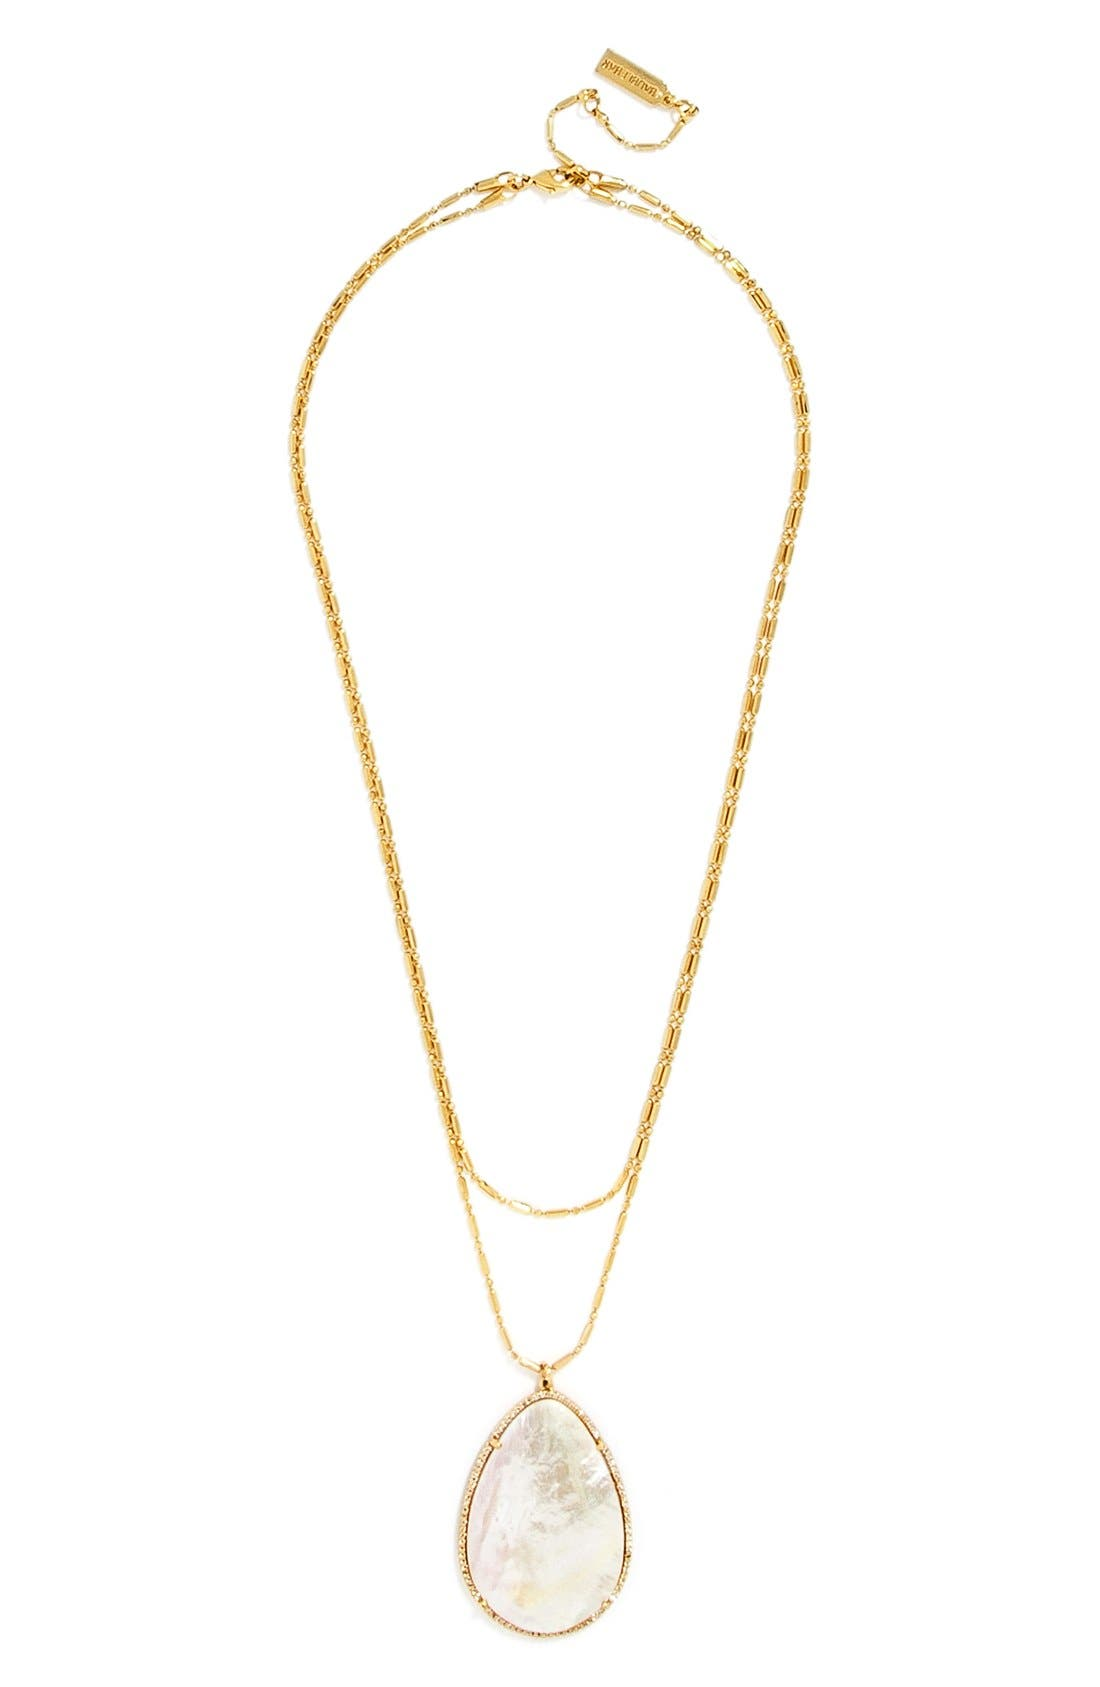 Main Image - BaubleBar 'Seashell' Pendant Necklace